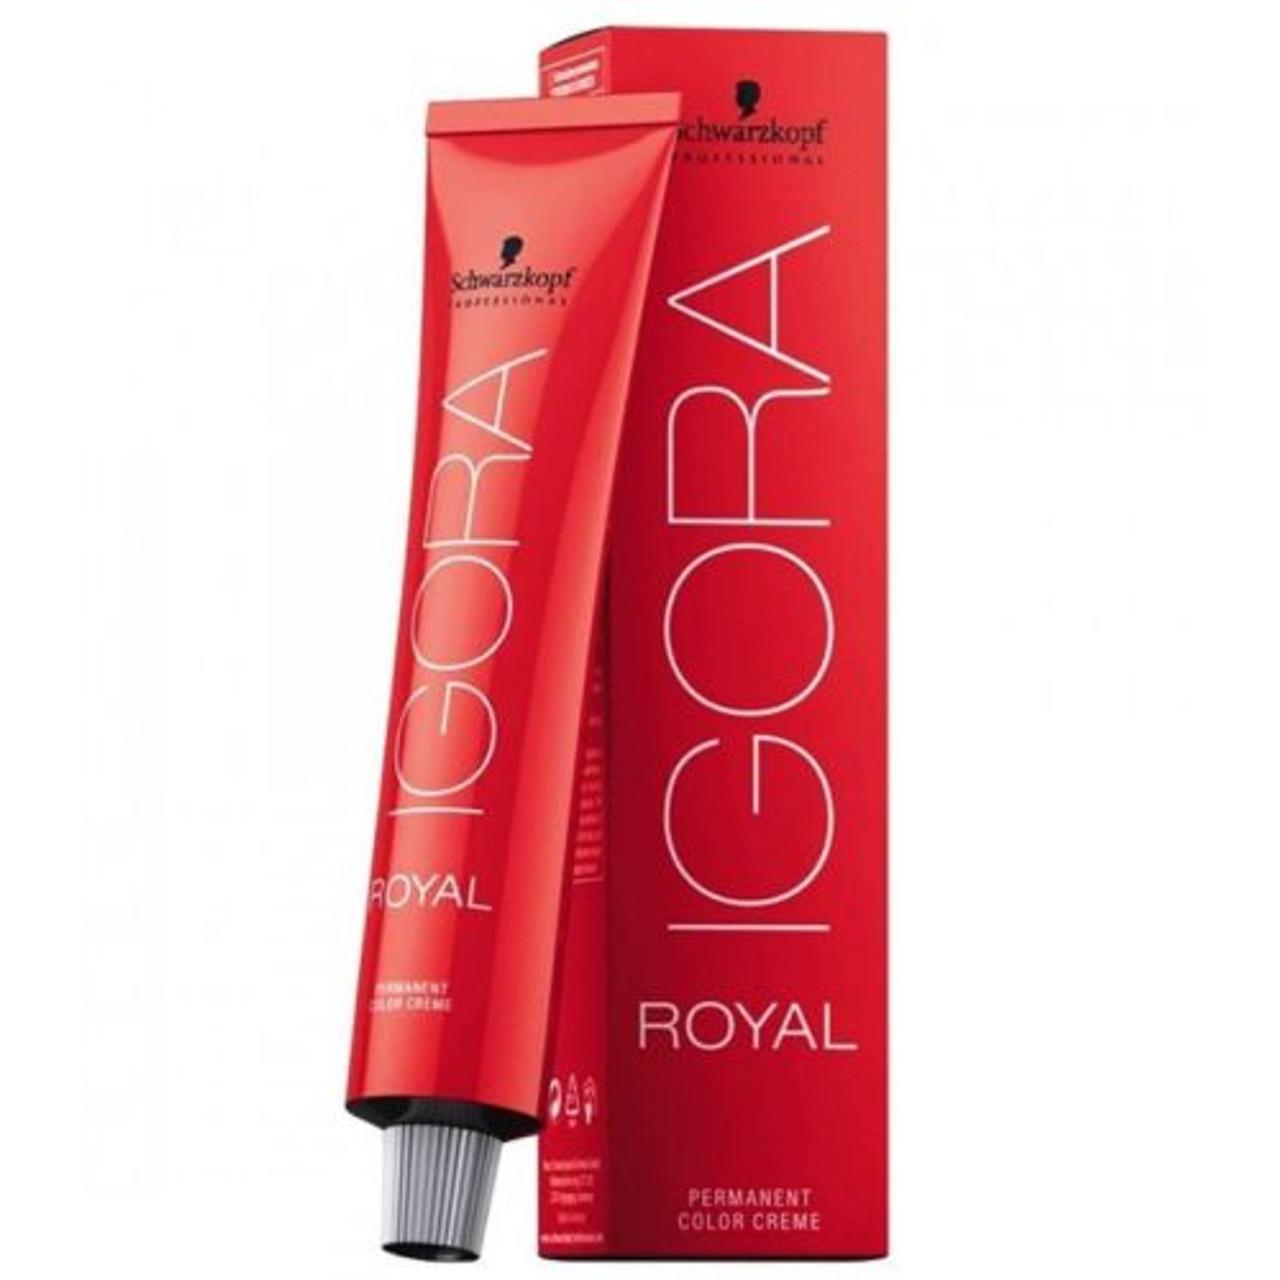 Schwarzkopf Igora Royal Permanent Color Creme - 4-68 Medium Auburn Brown